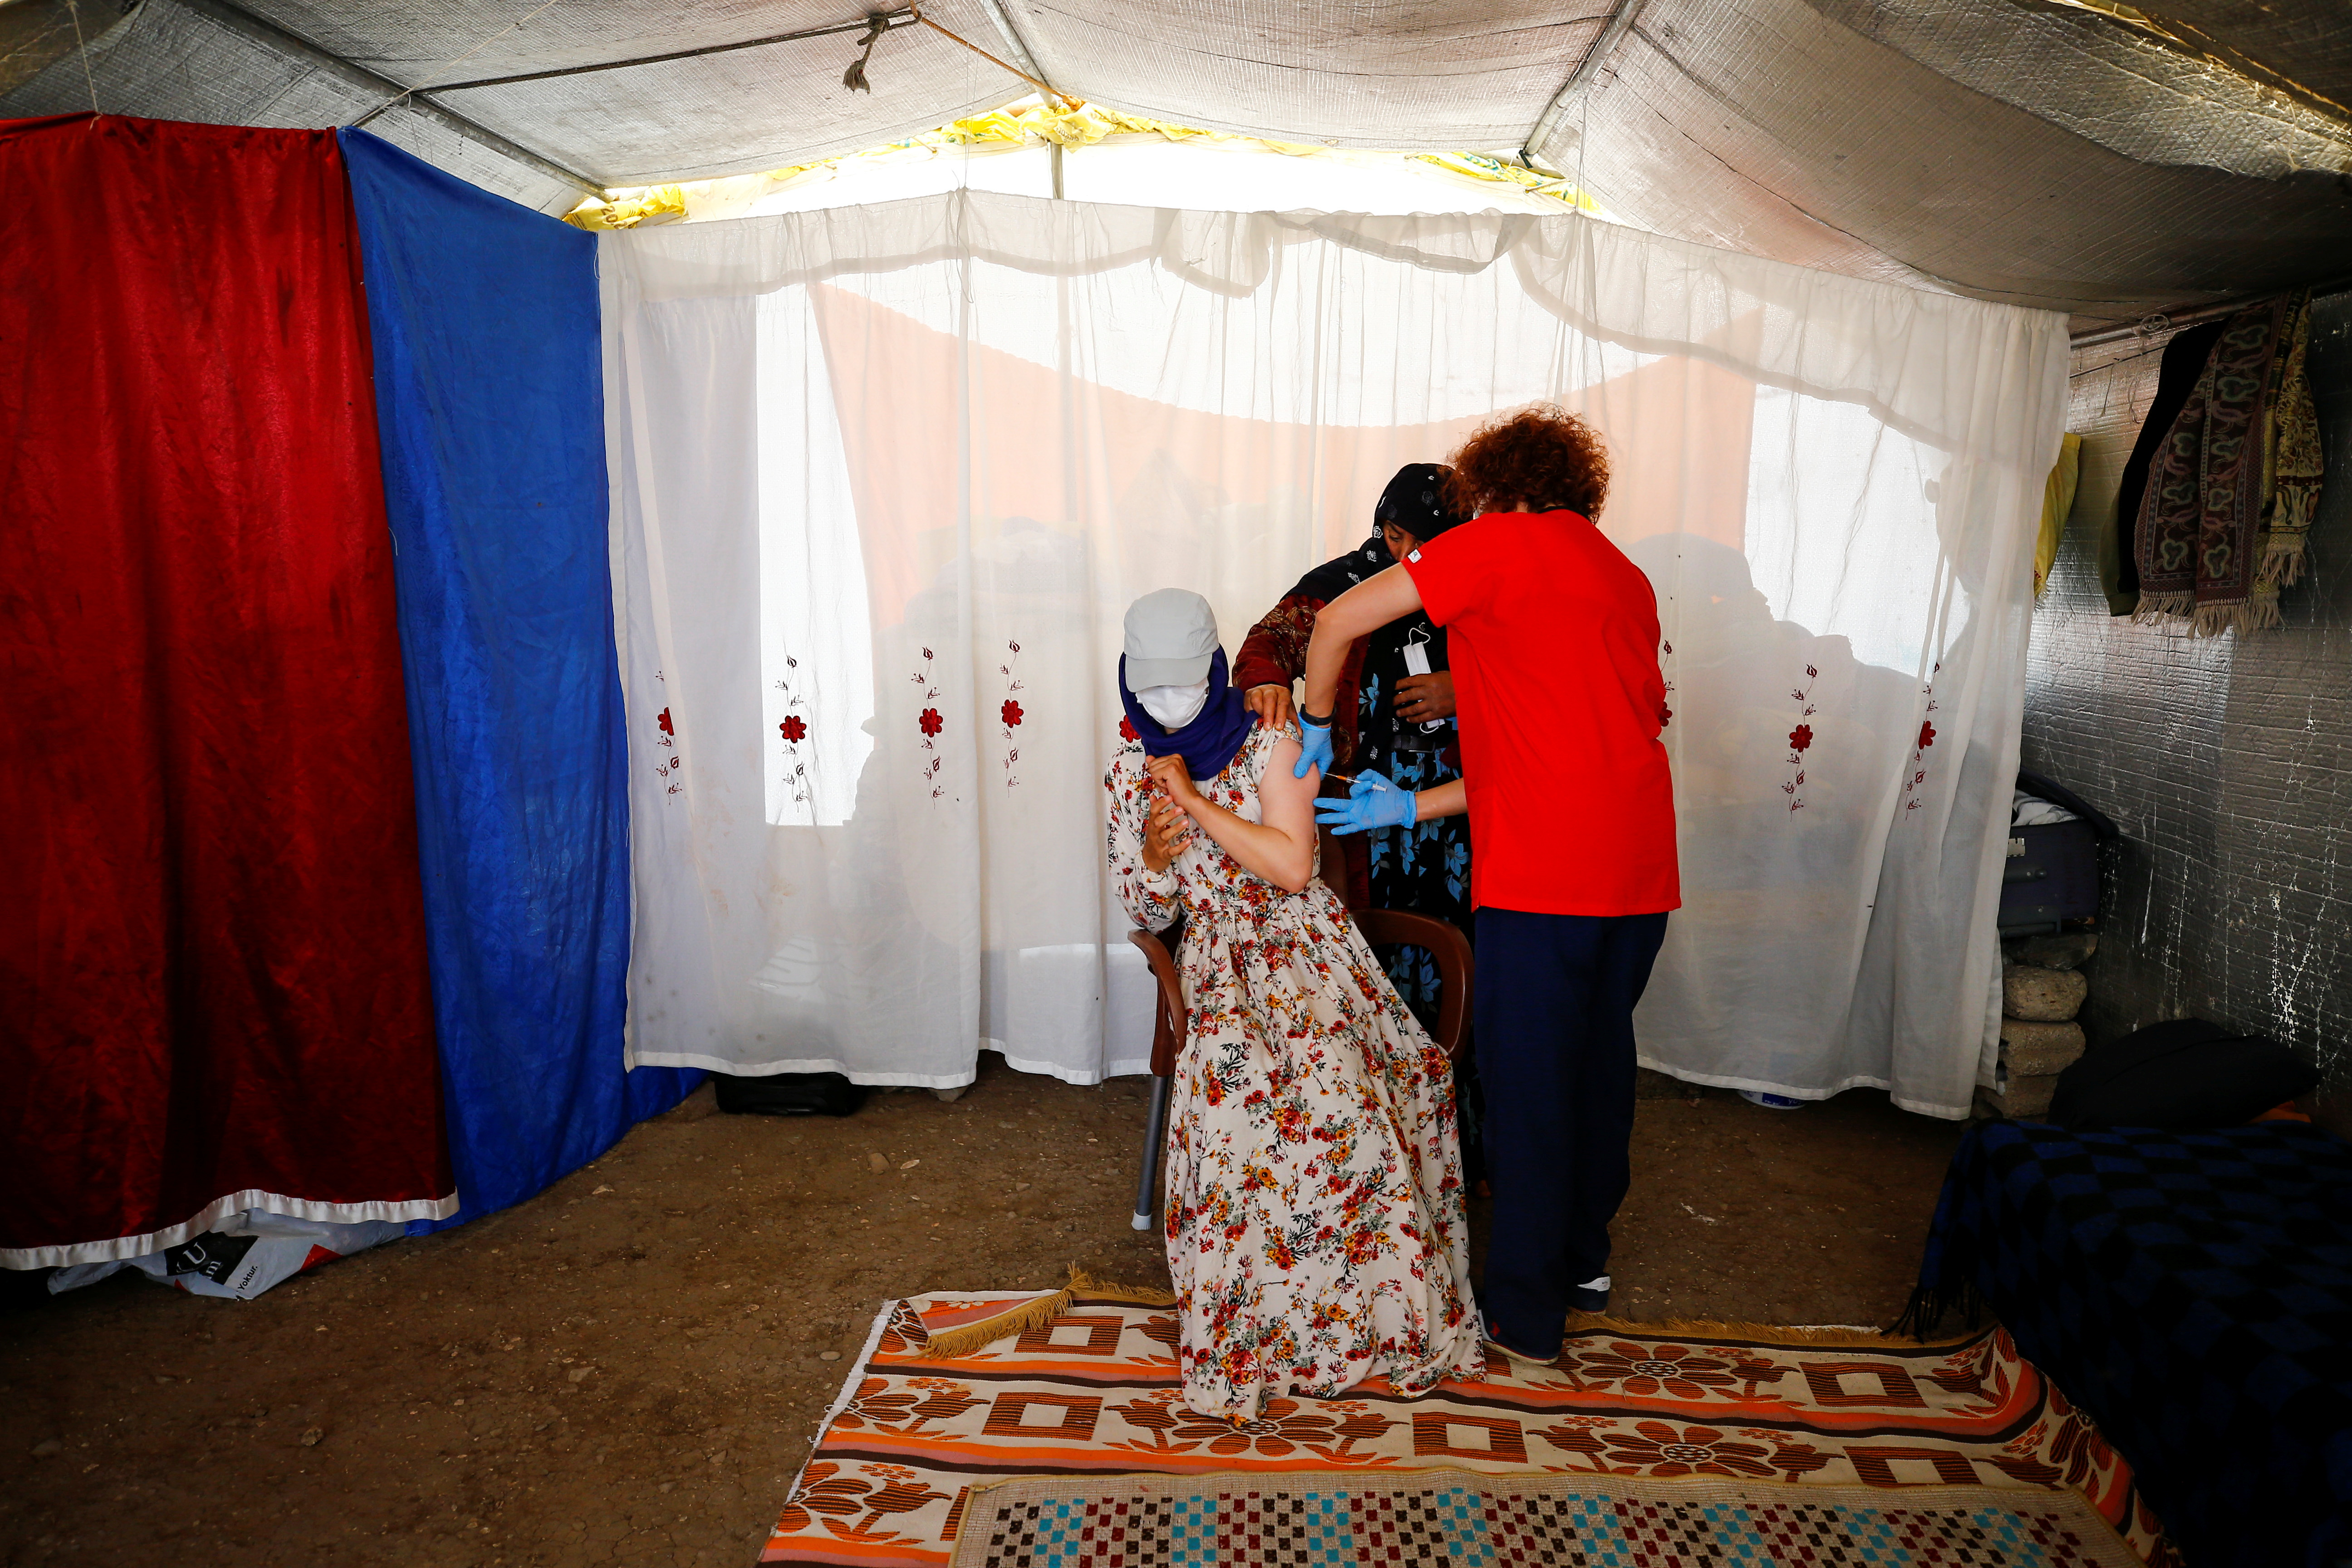 A seasonal farm worker receives a dose of the Pfizer-BioNTech coronavirus disease (COVID-19) vaccine in the village of Oguzlar near Polatli as nationwide vaccination continues, in Ankara, Turkey July 8, 2021. REUTERS/Cagla Gurdogan